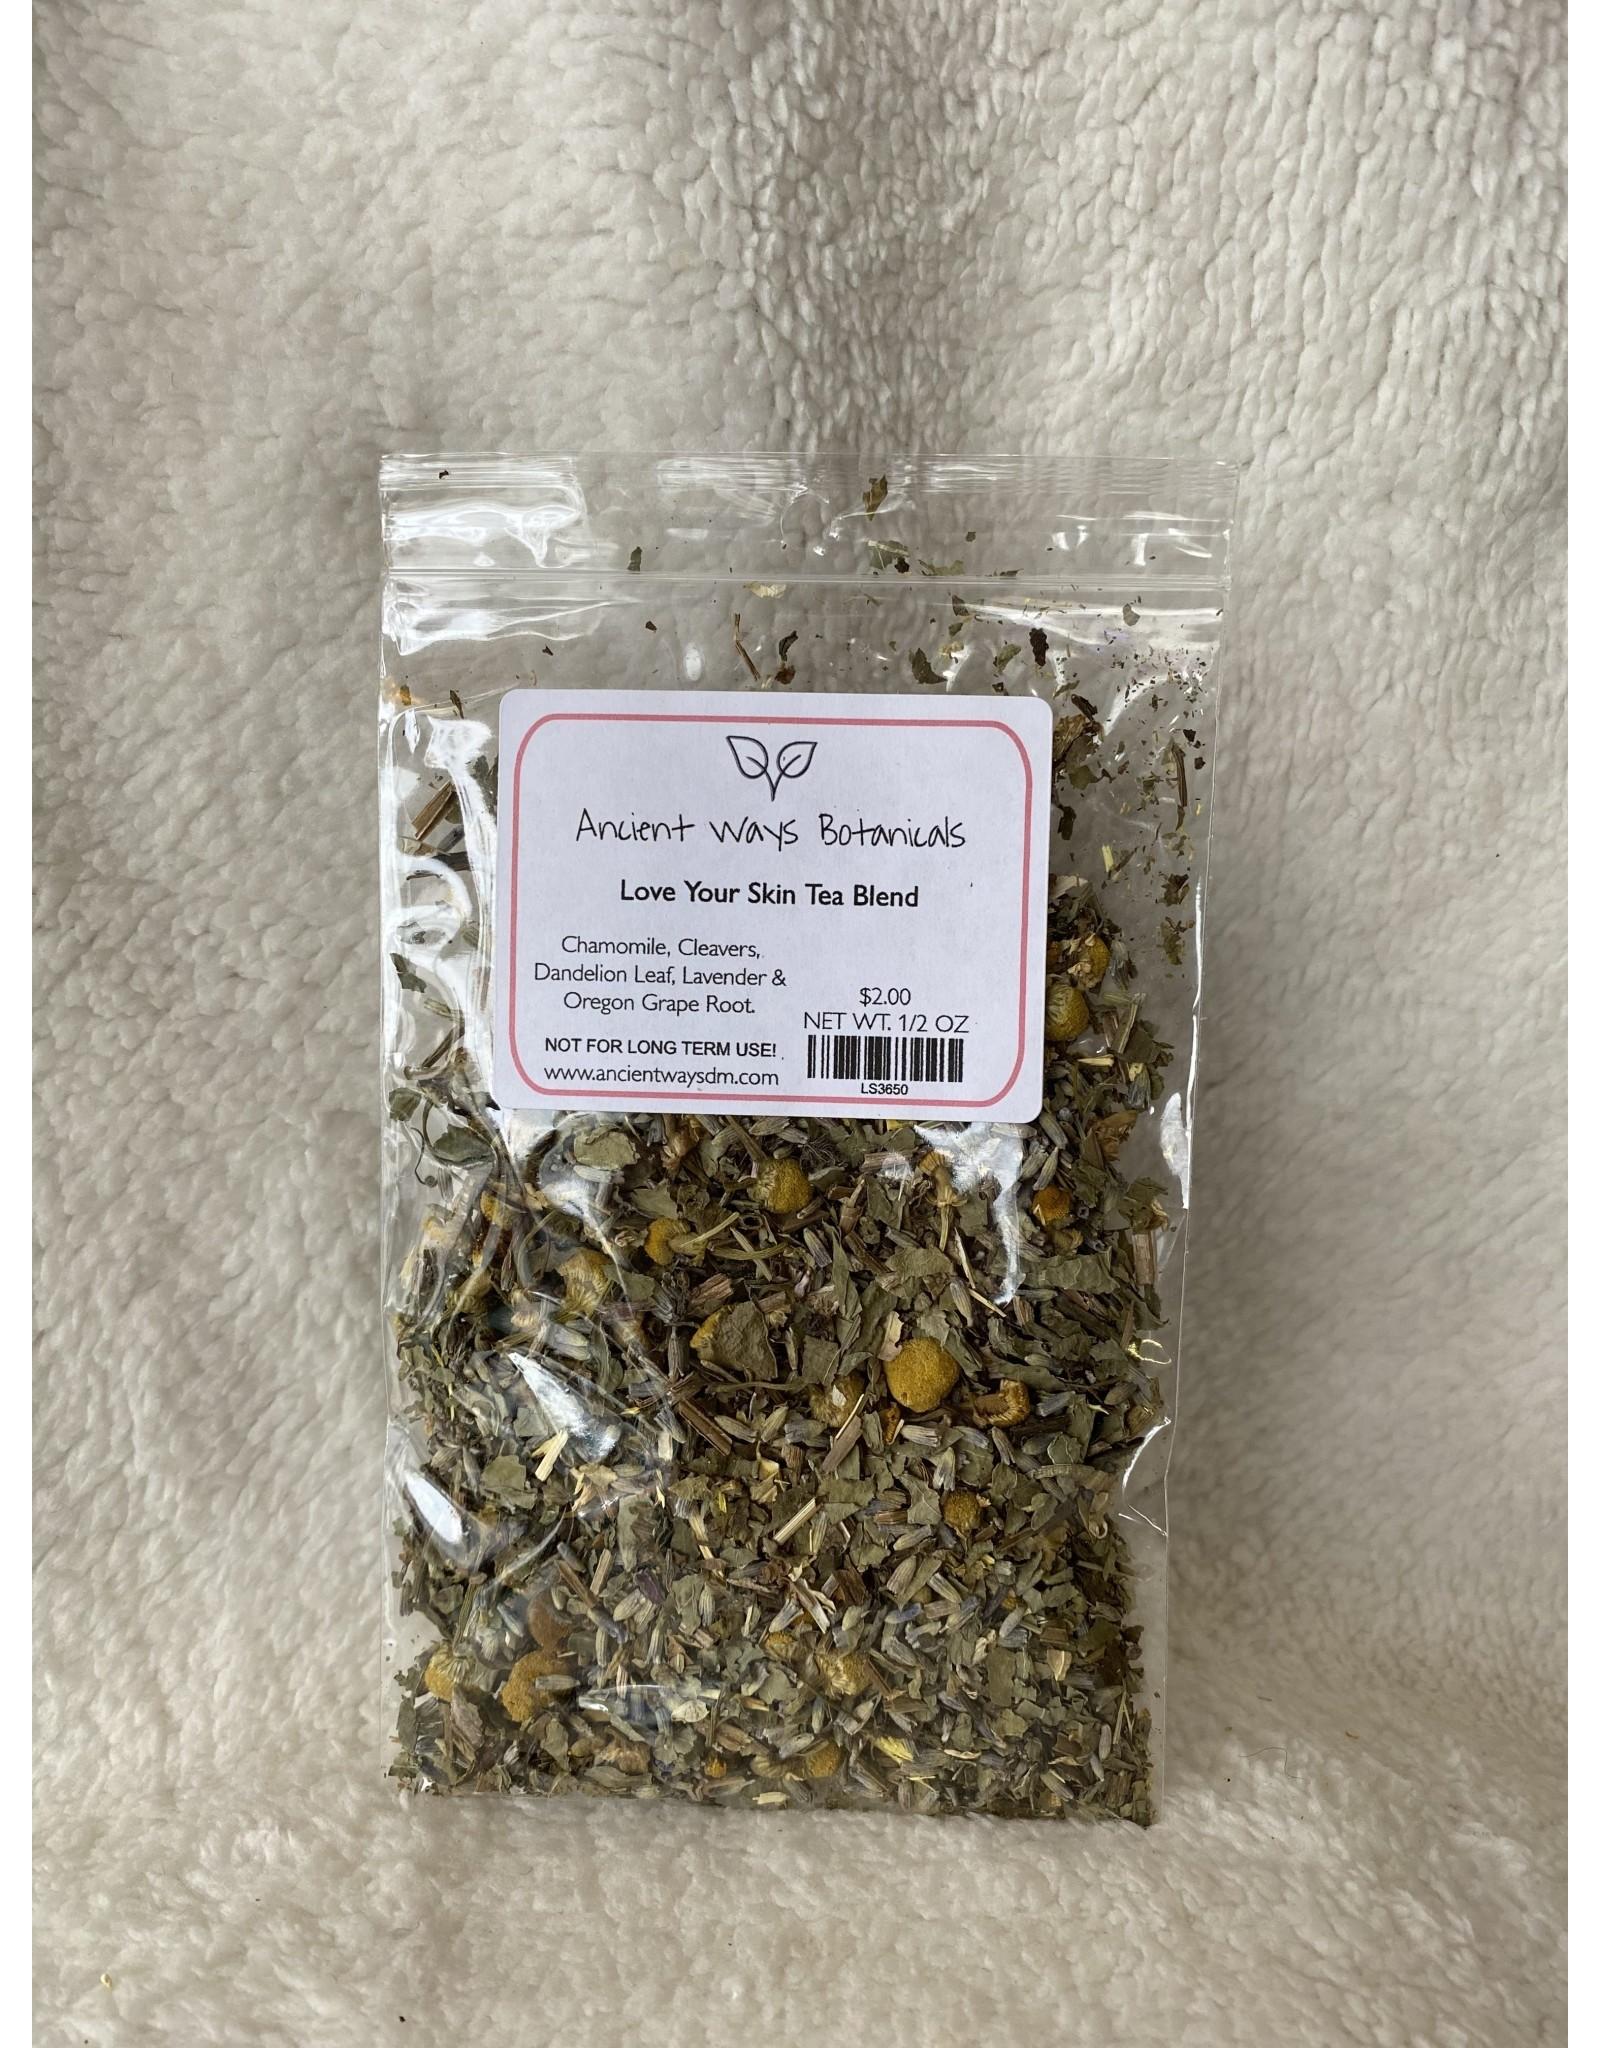 Love Your Skin Tea Blend - 1/2 oz.